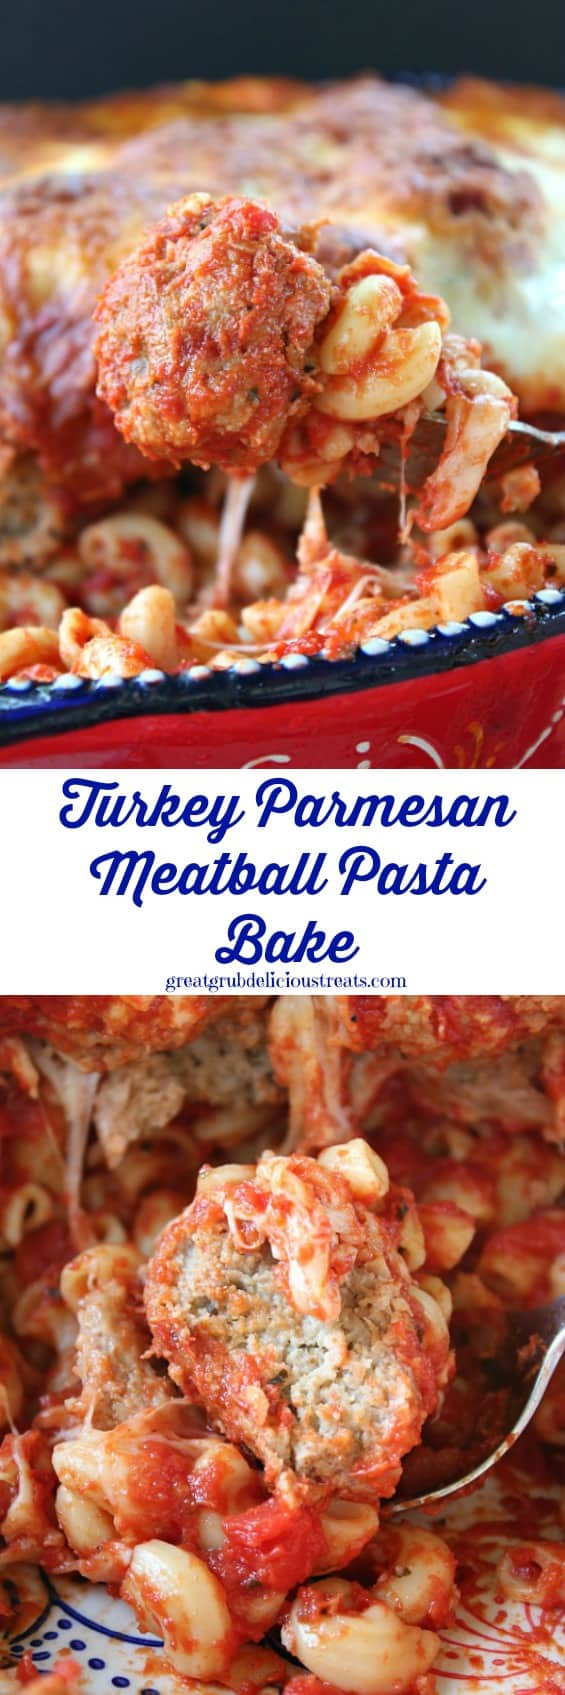 Turkey Parmesan Meatball Pasta Bake